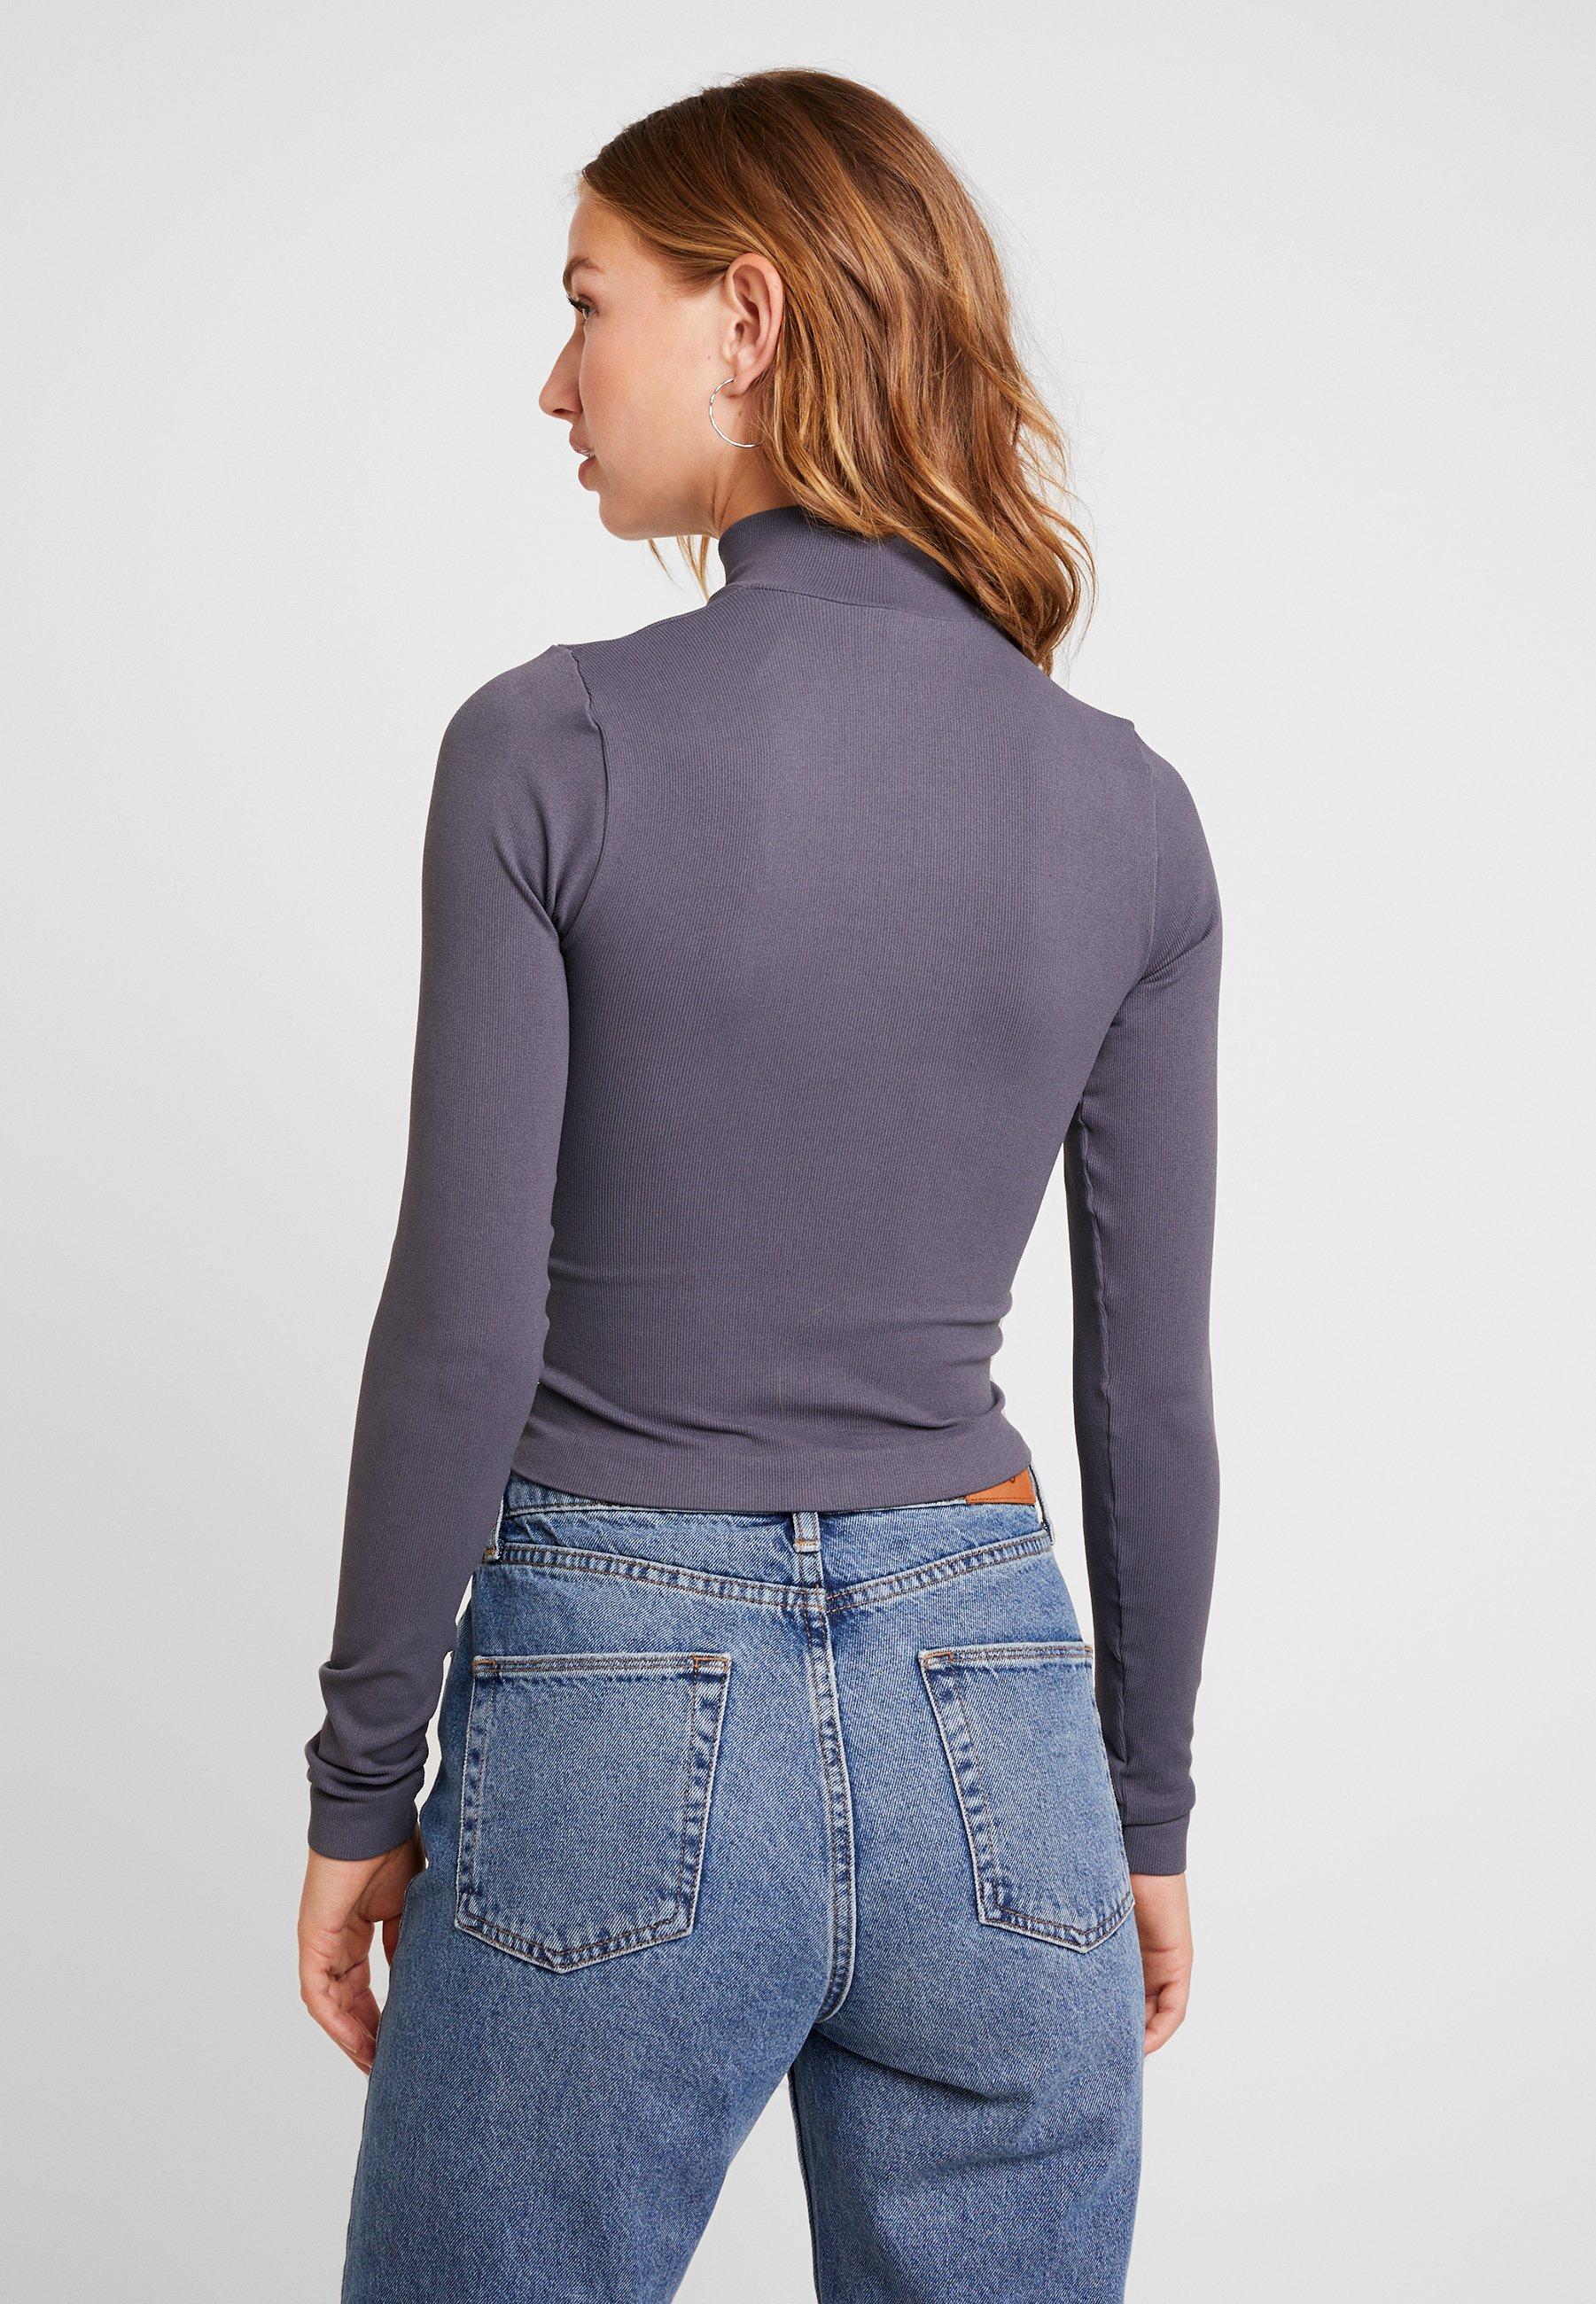 FunnelT Zip Bdg Shadow Urban Outfitters shirt Longues Dark Manches À qUzpSGjLVM